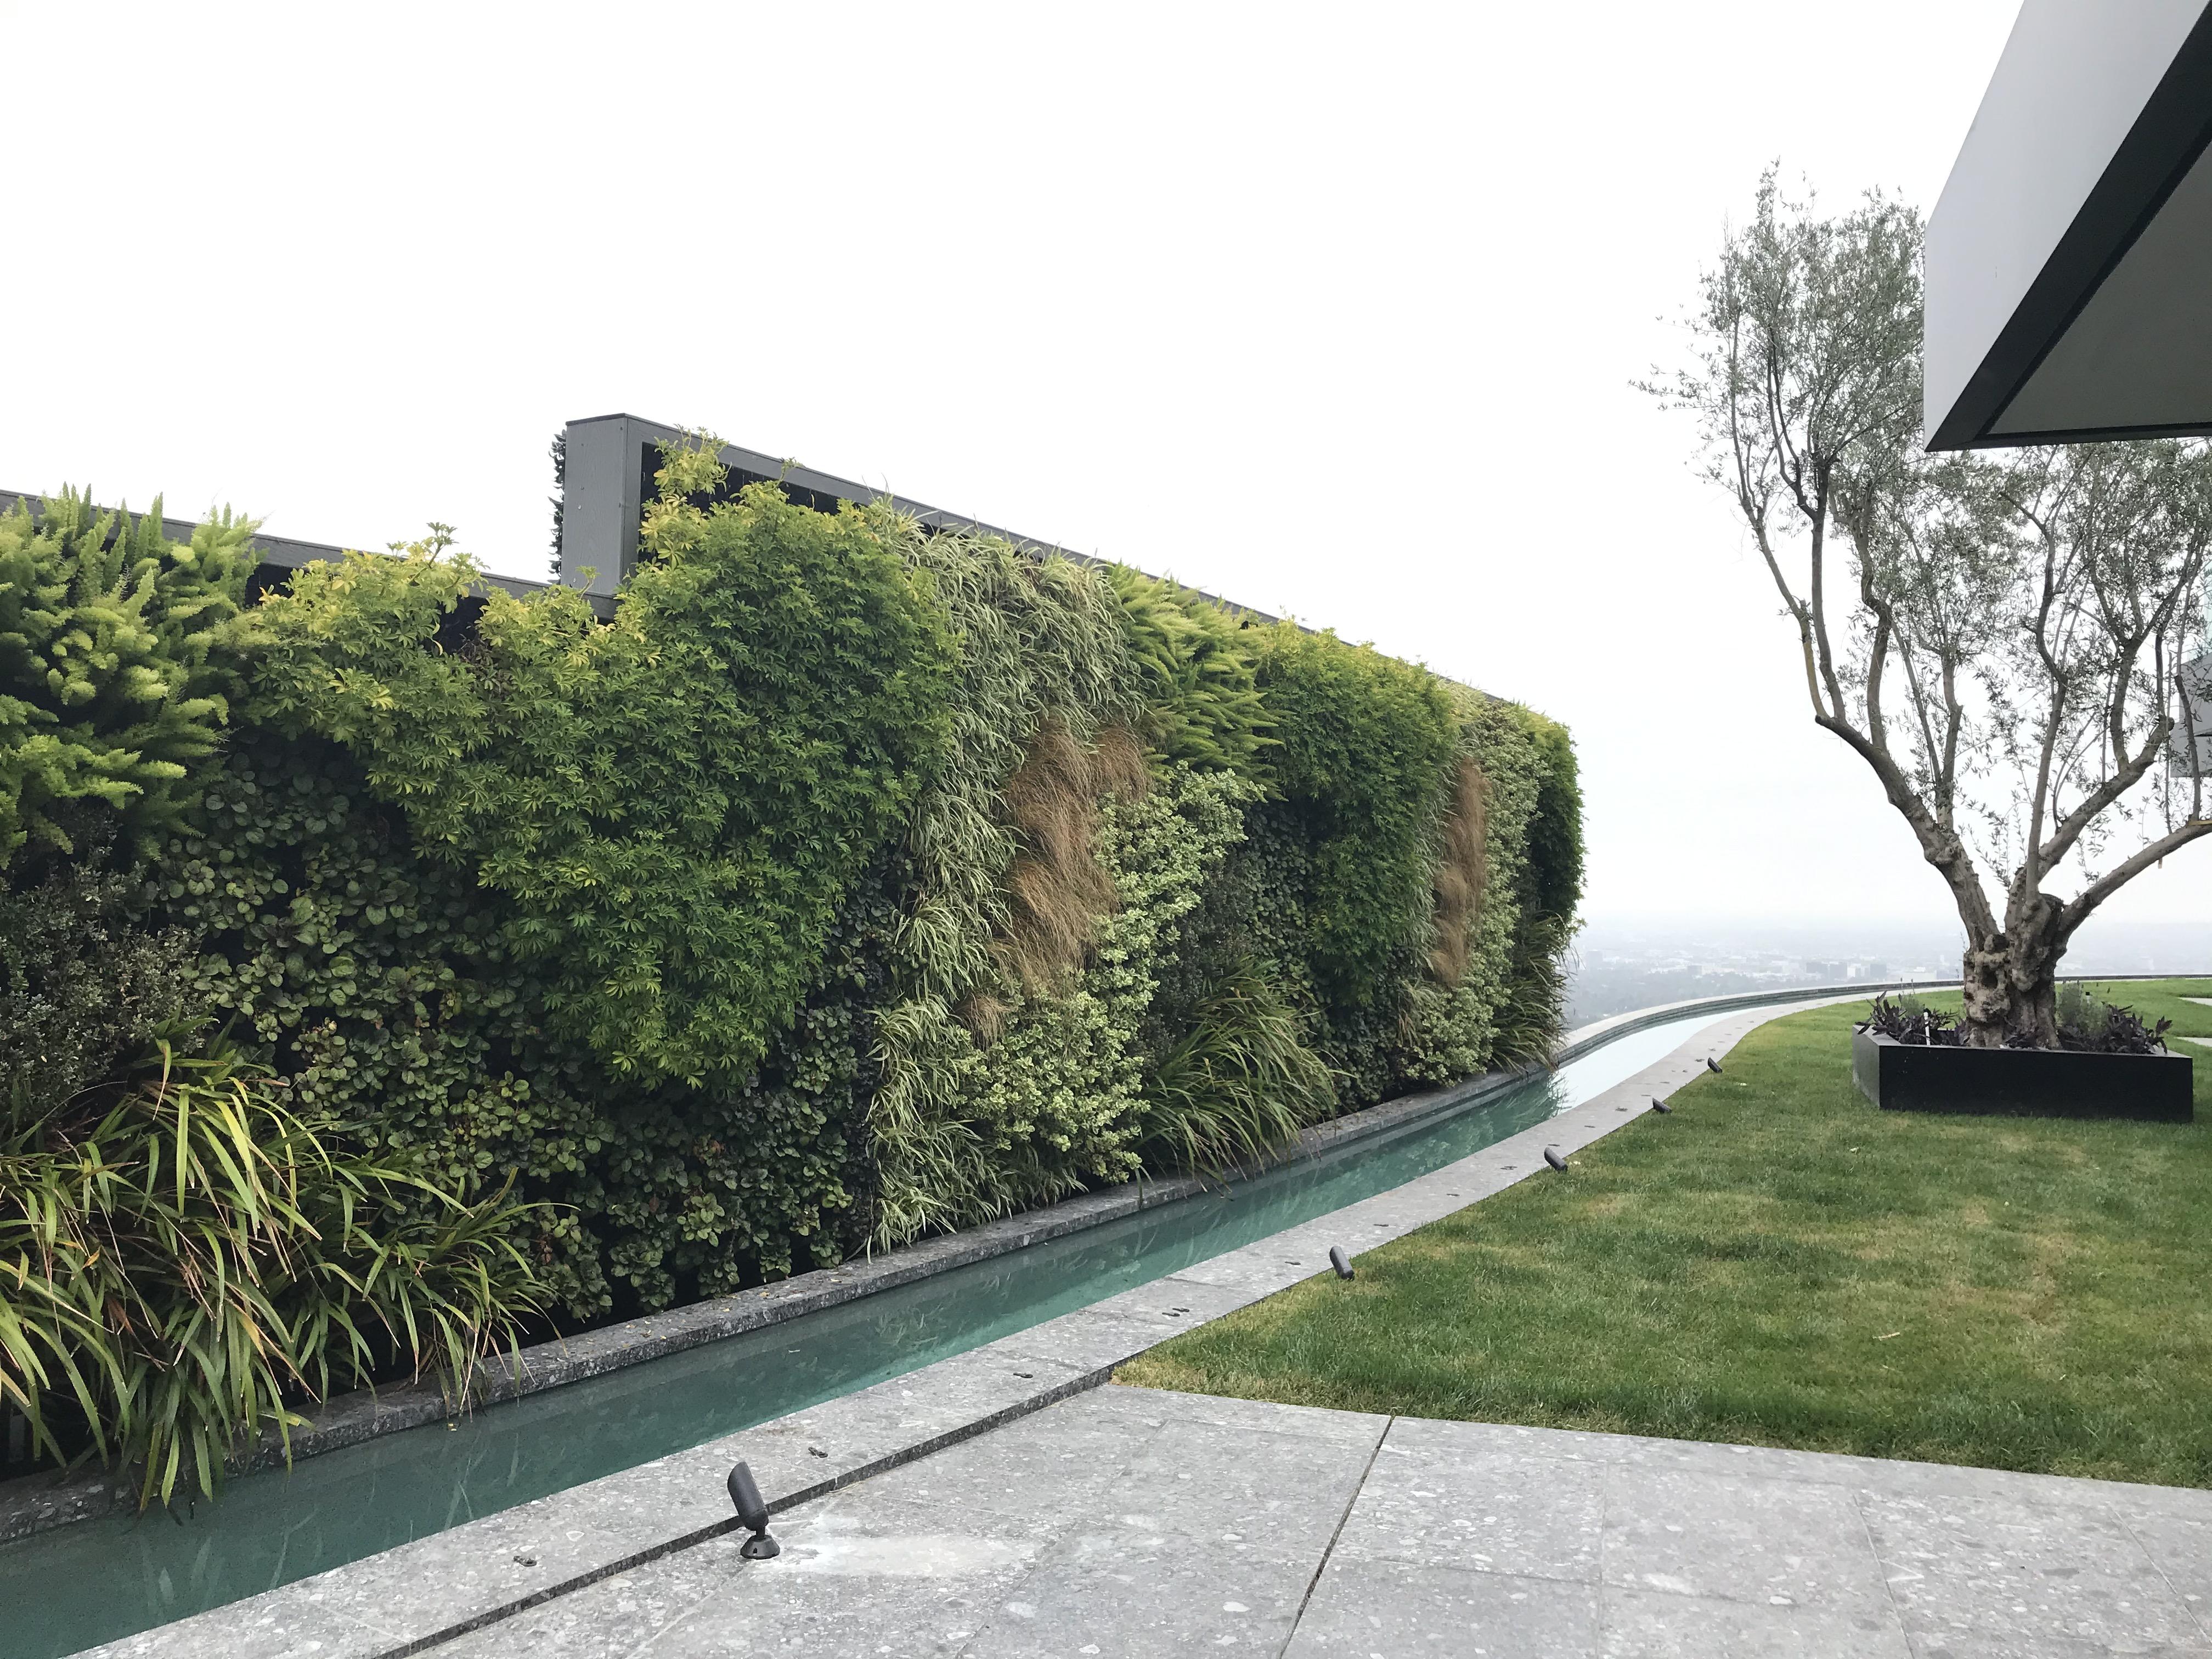 An outdoor greenwall